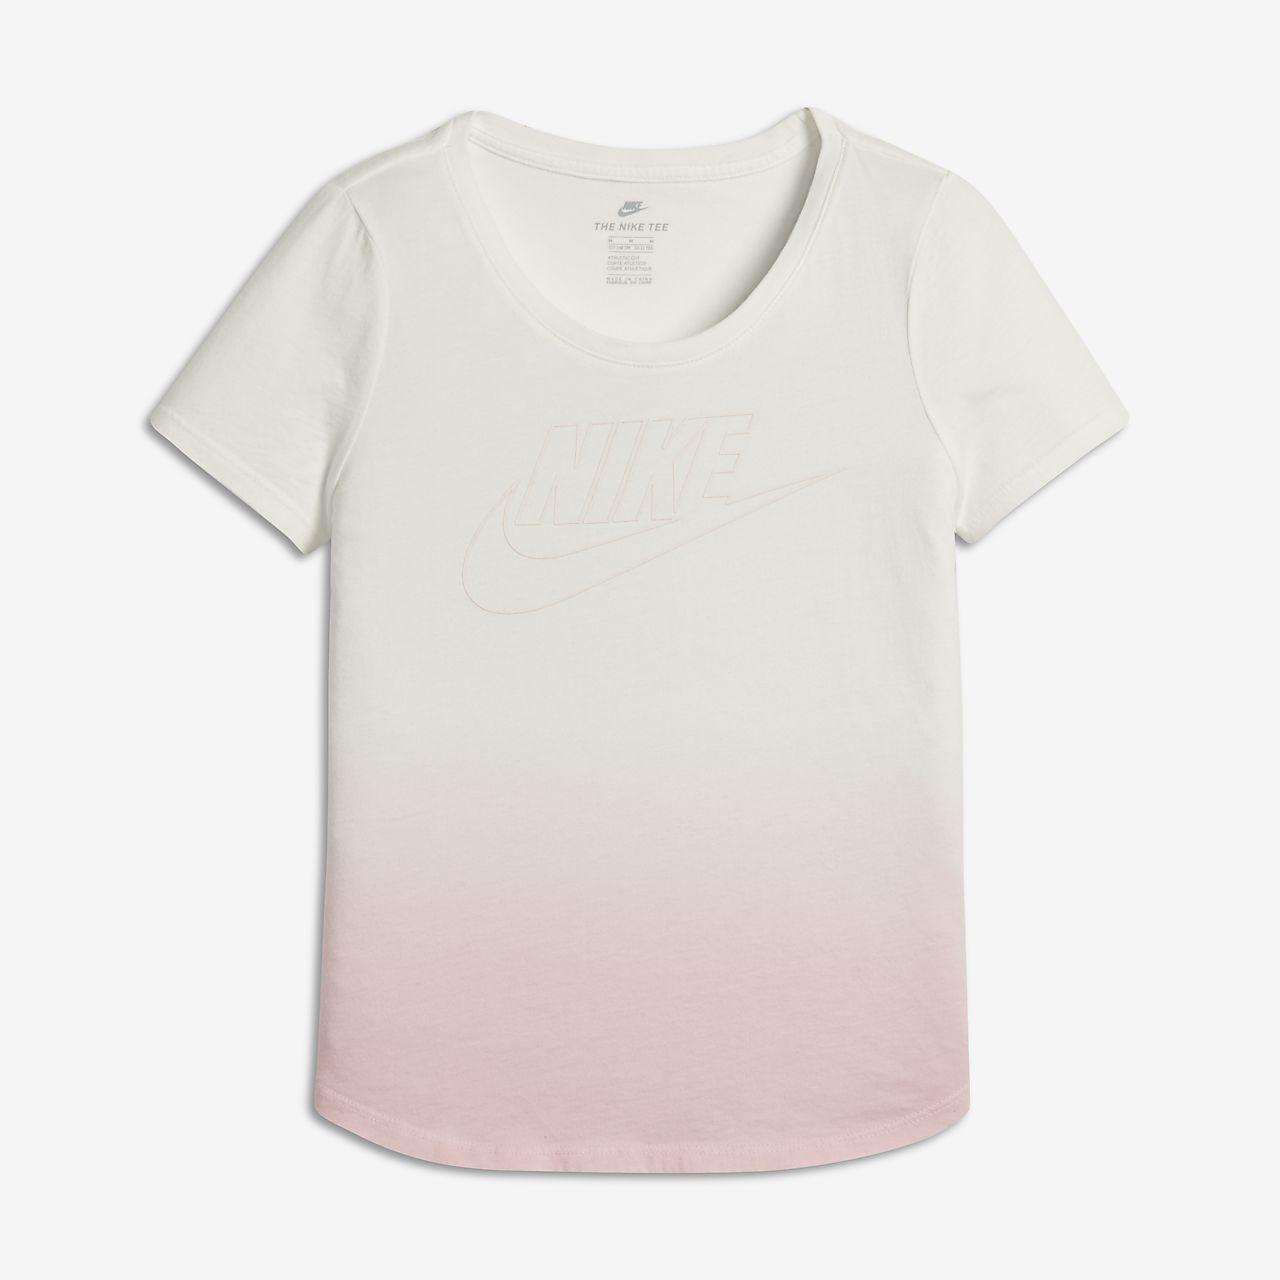 Nike Sportswear Older Kids  (Girls ) T-Shirt  a850db6d37139